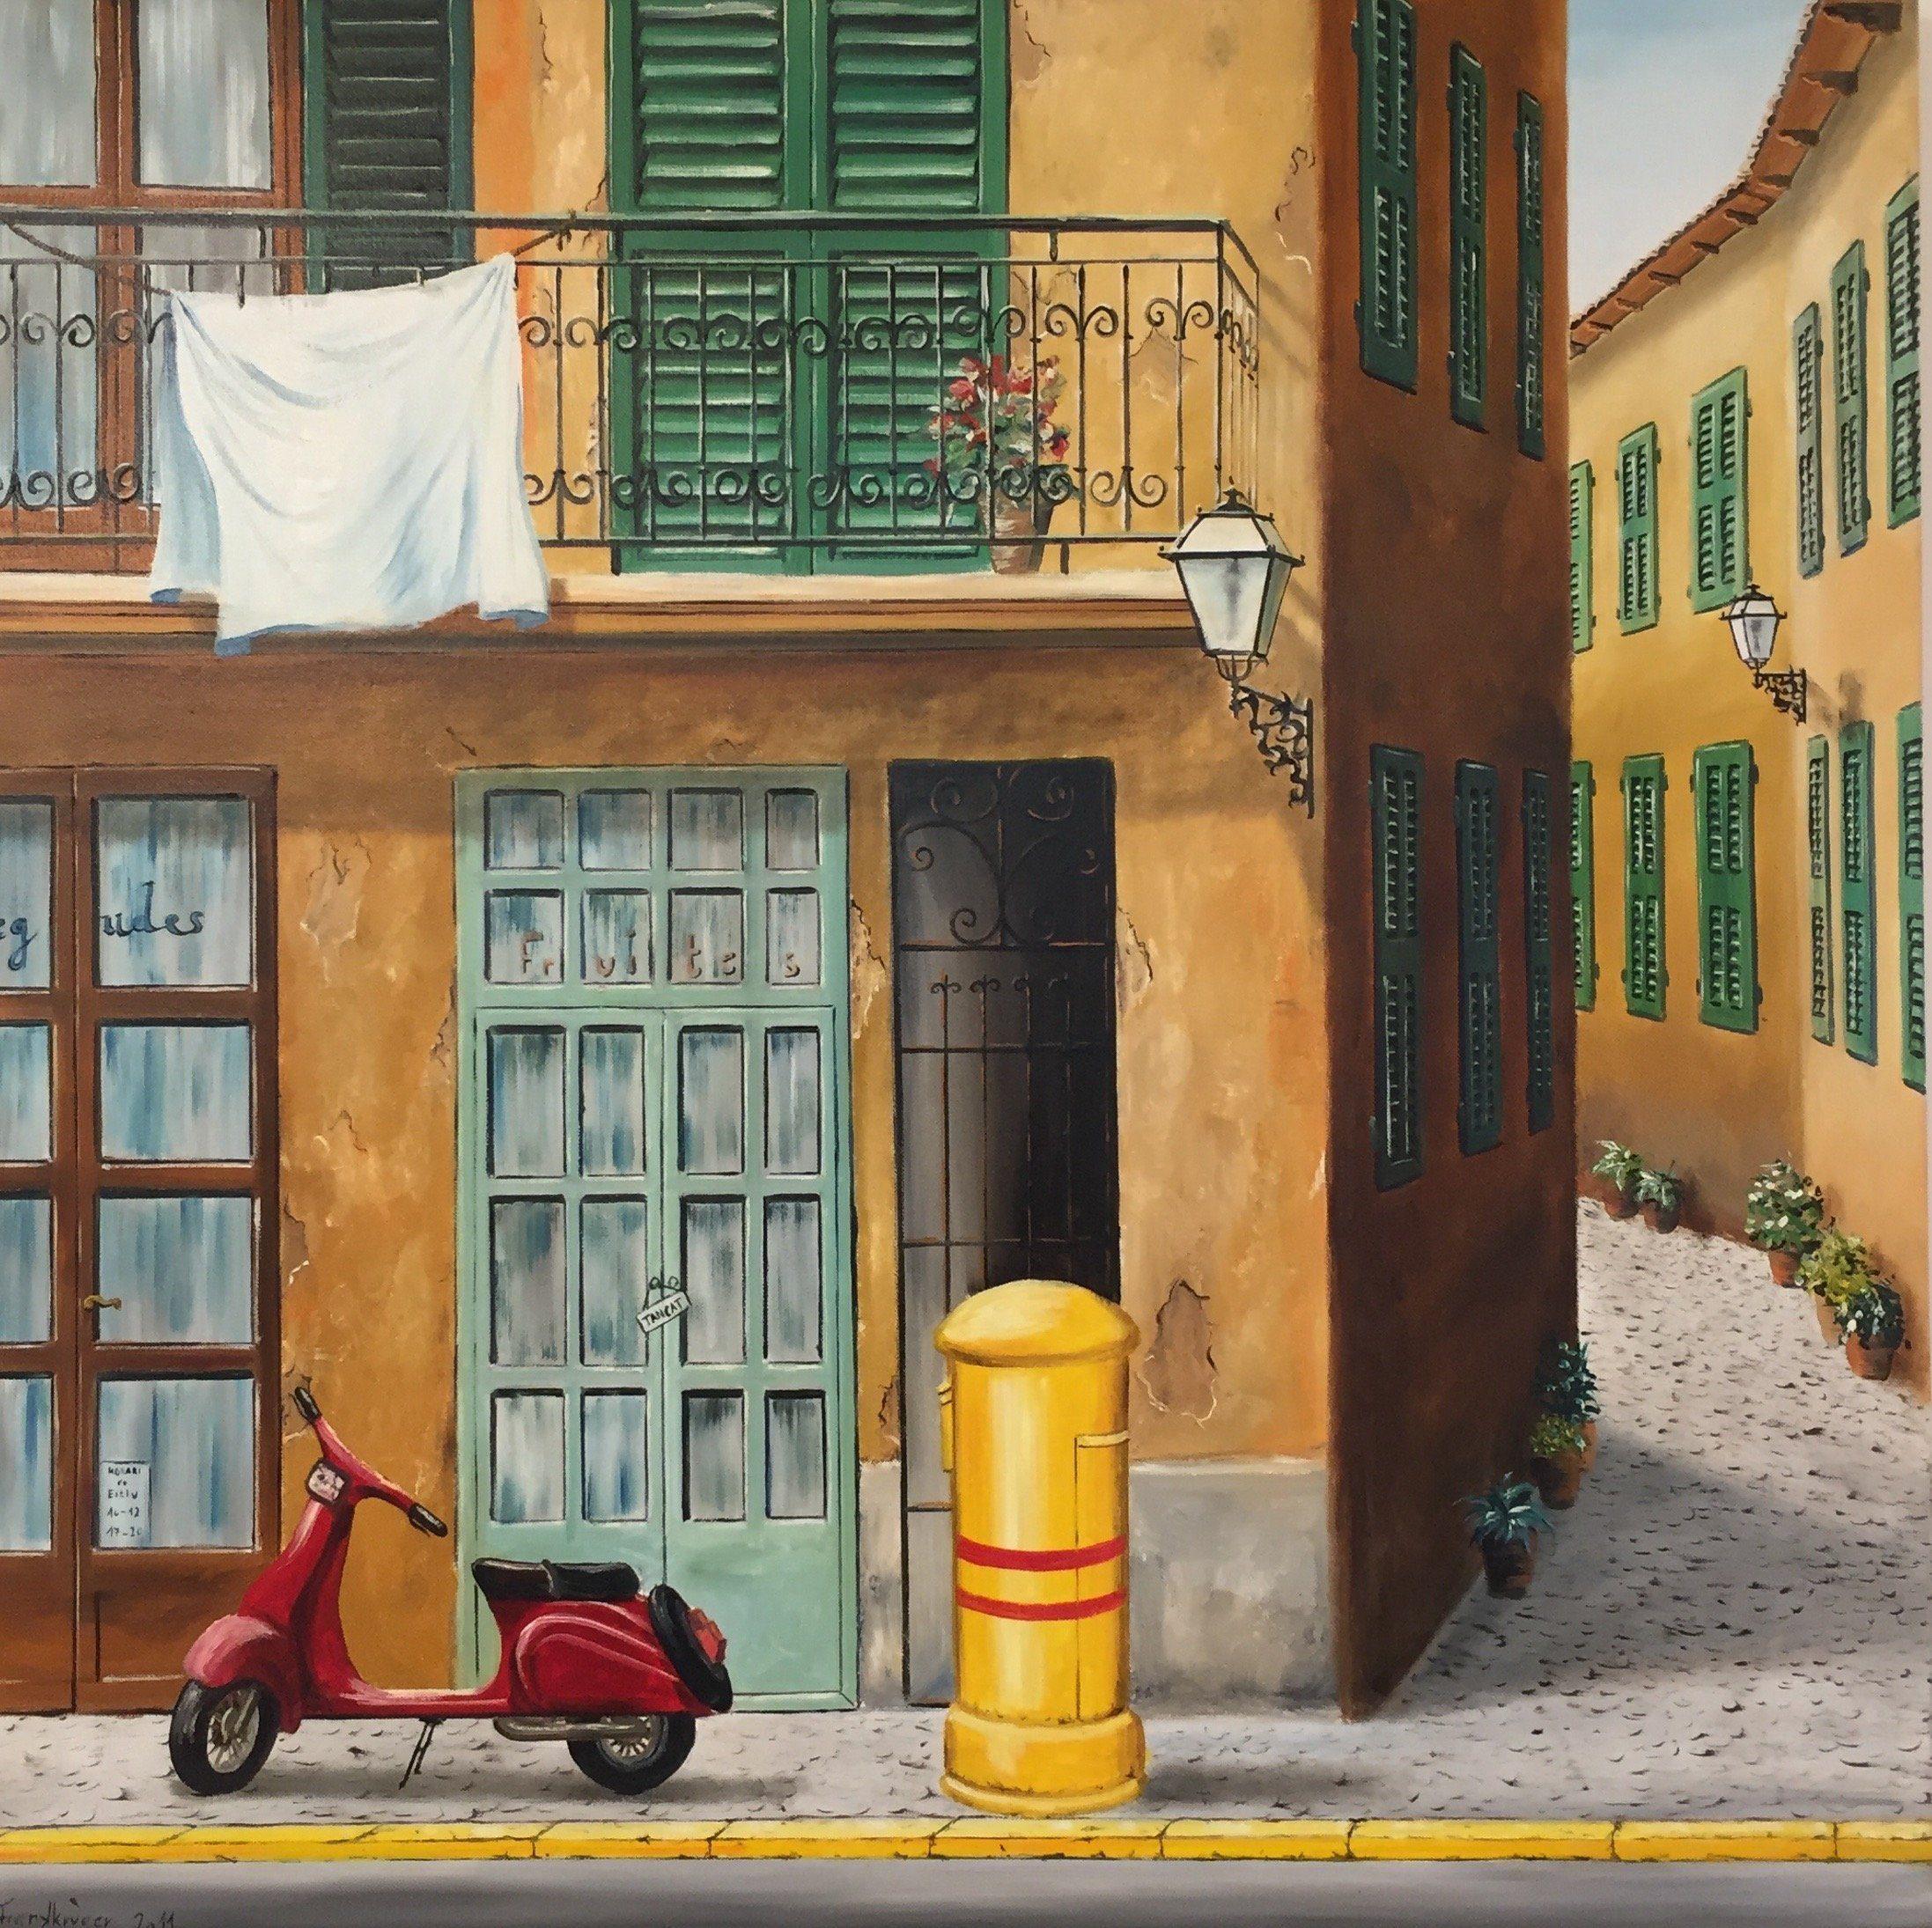 Calle en Palma